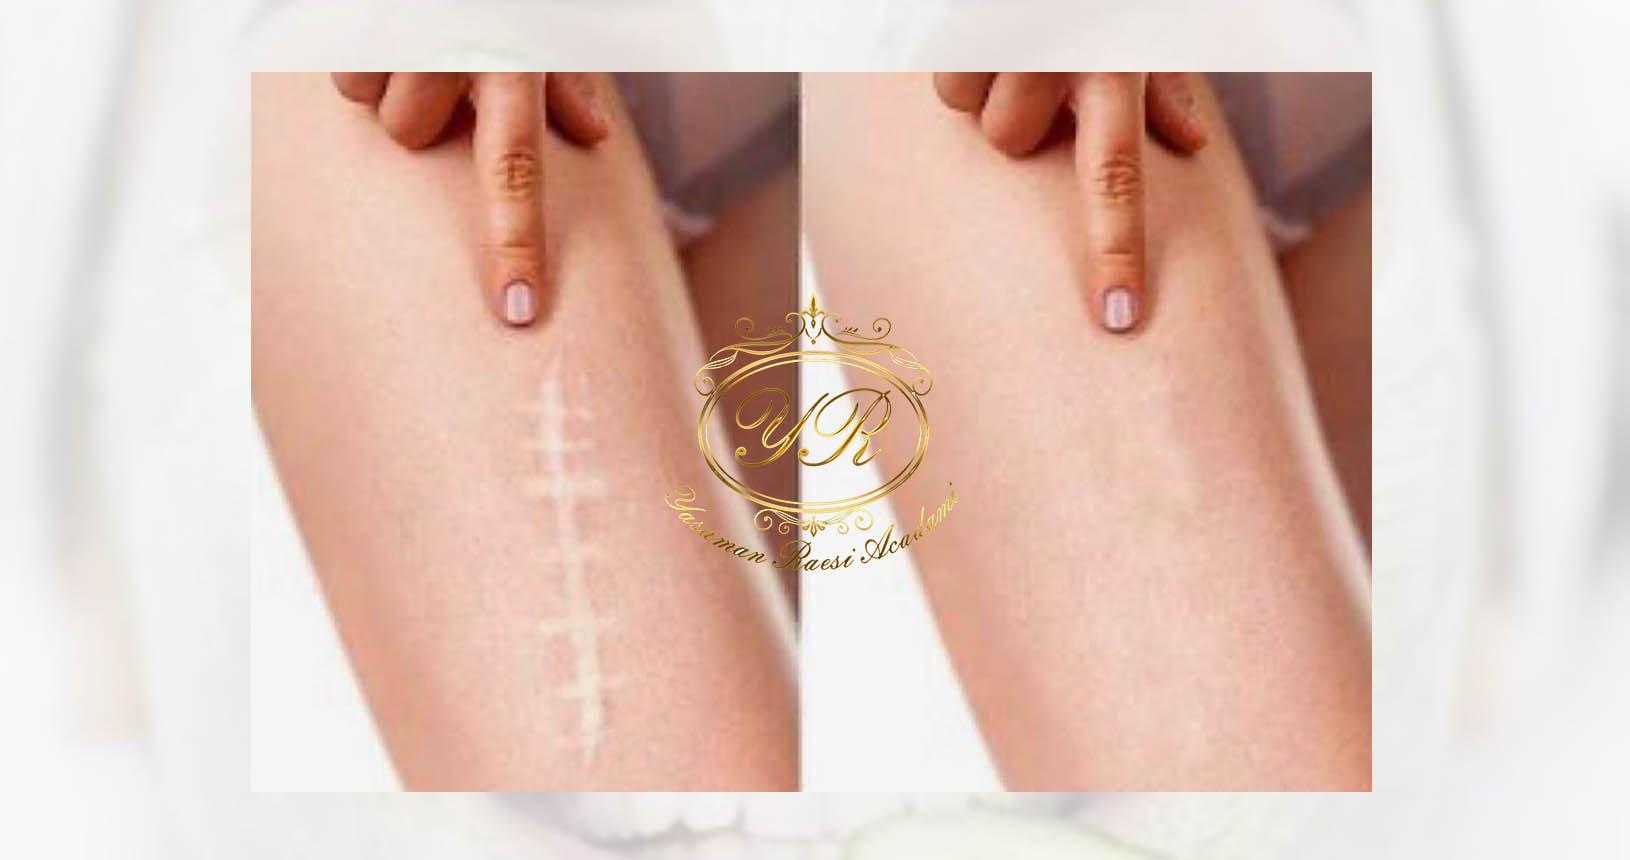 کلینیک تخصصی پوست یاسمن رئیسی